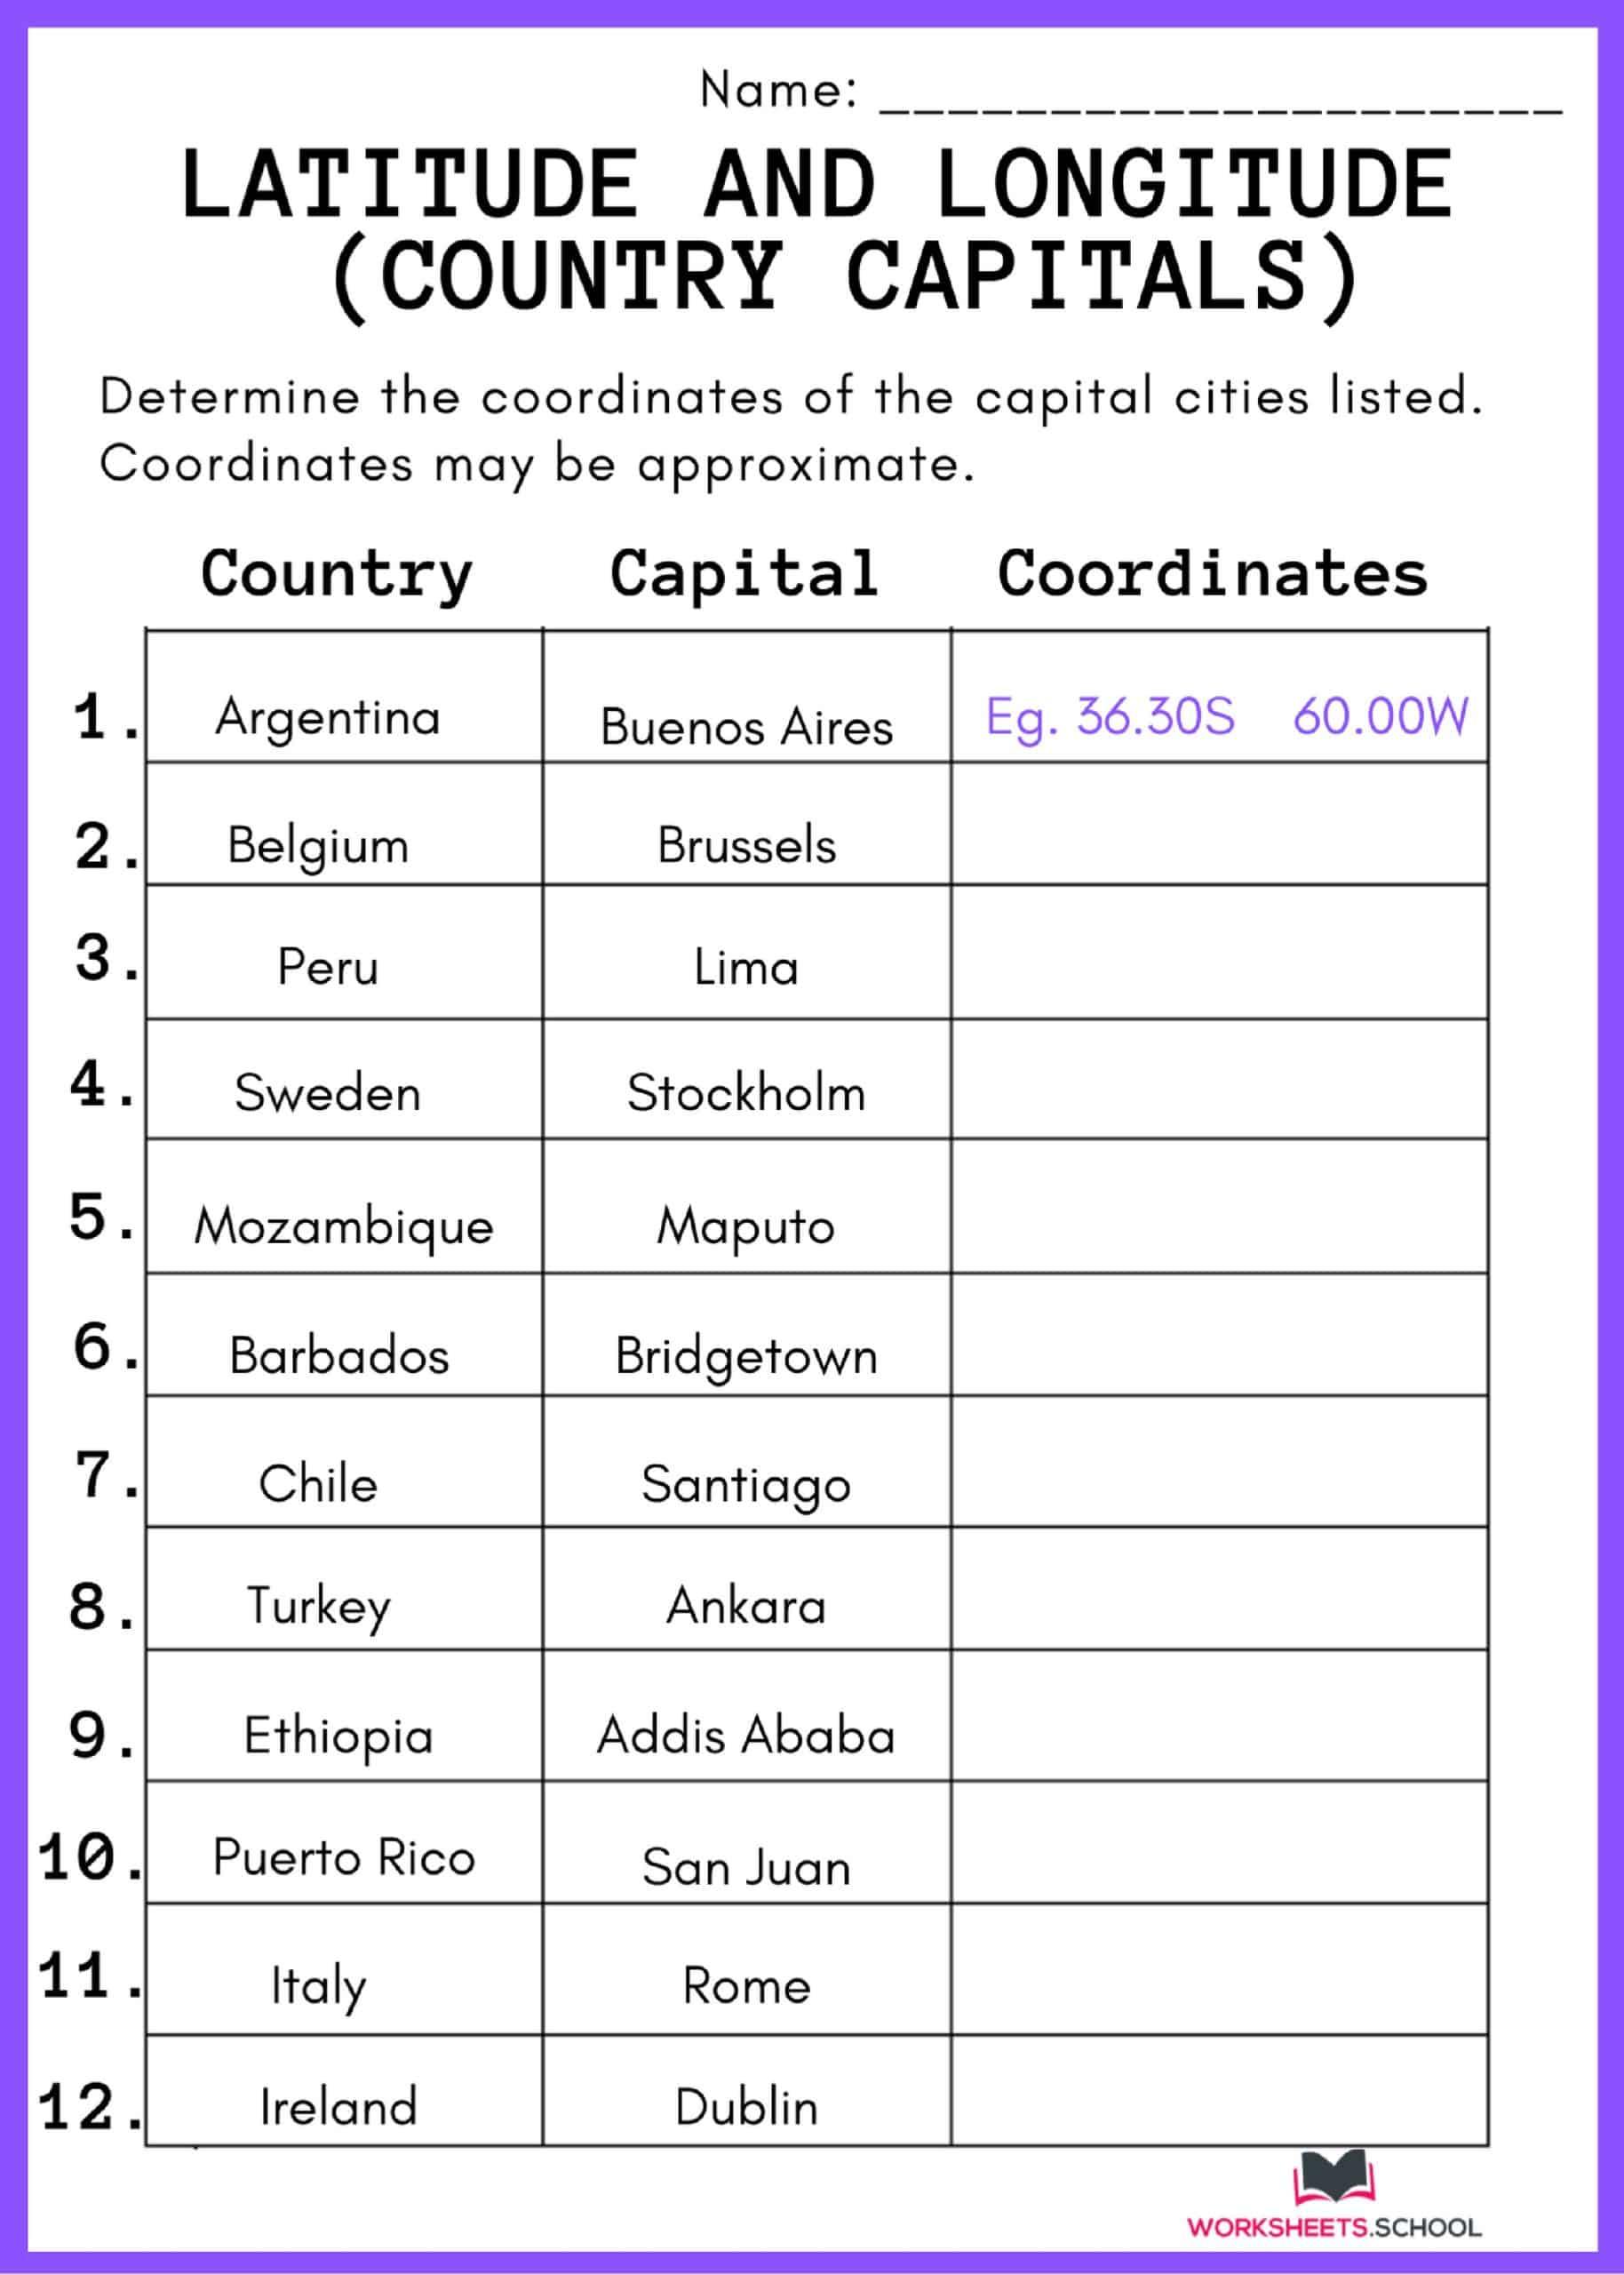 Latitude and Longitude Worksheet - Country Capitals